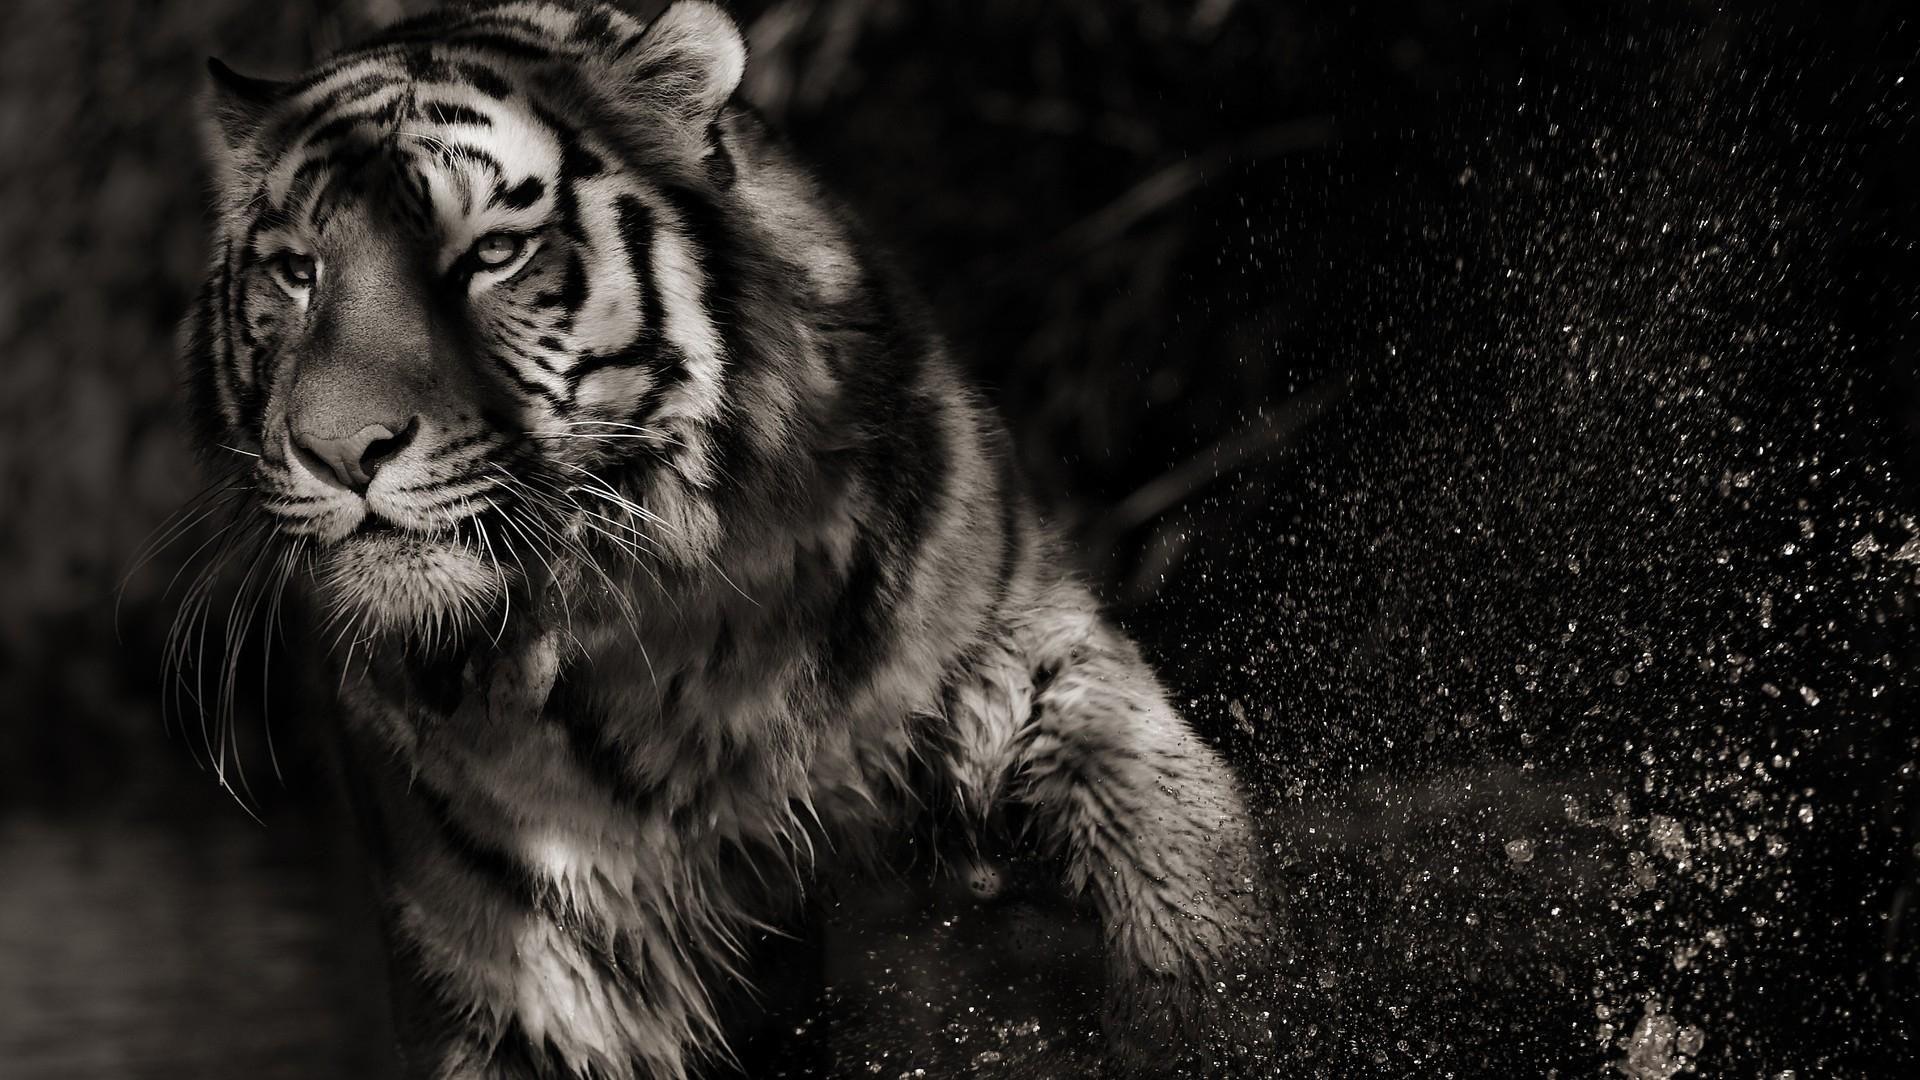 White Tiger, Best Wallpaper